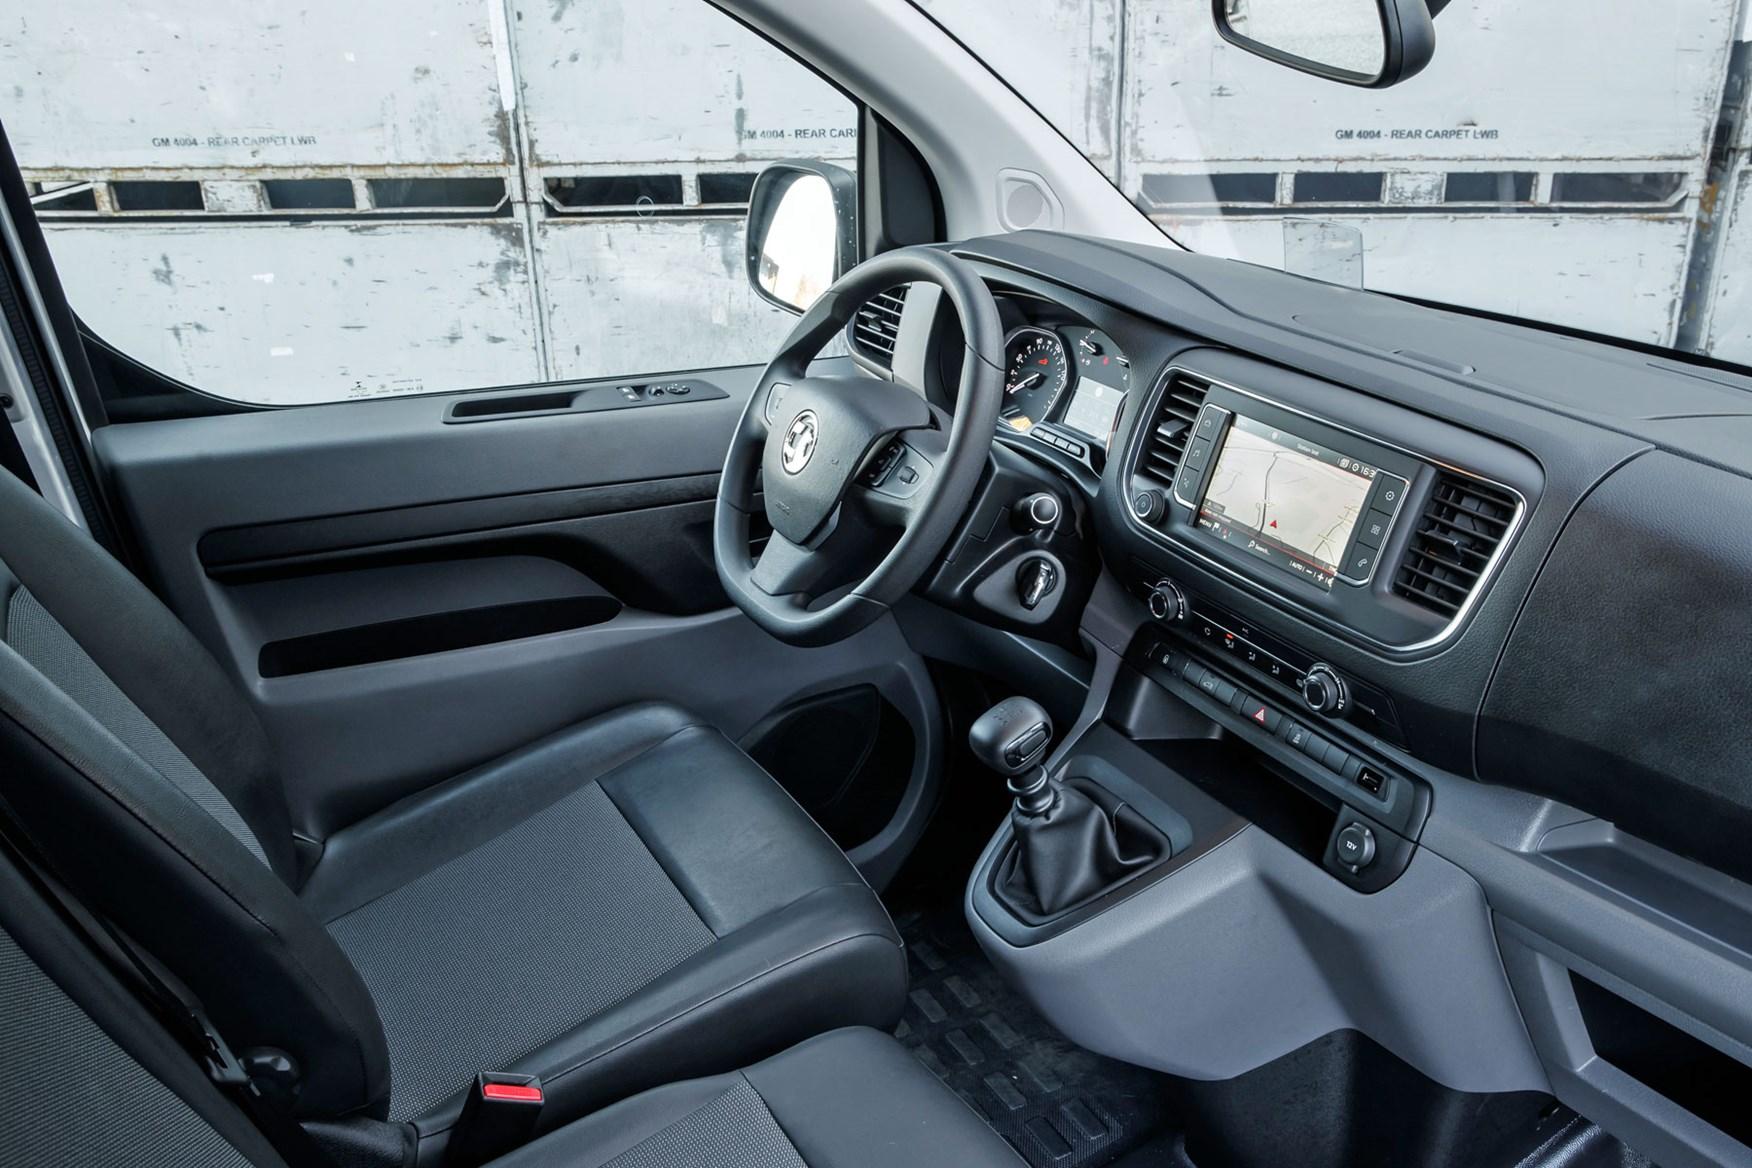 Vauxhall Vivaro review - cab interior